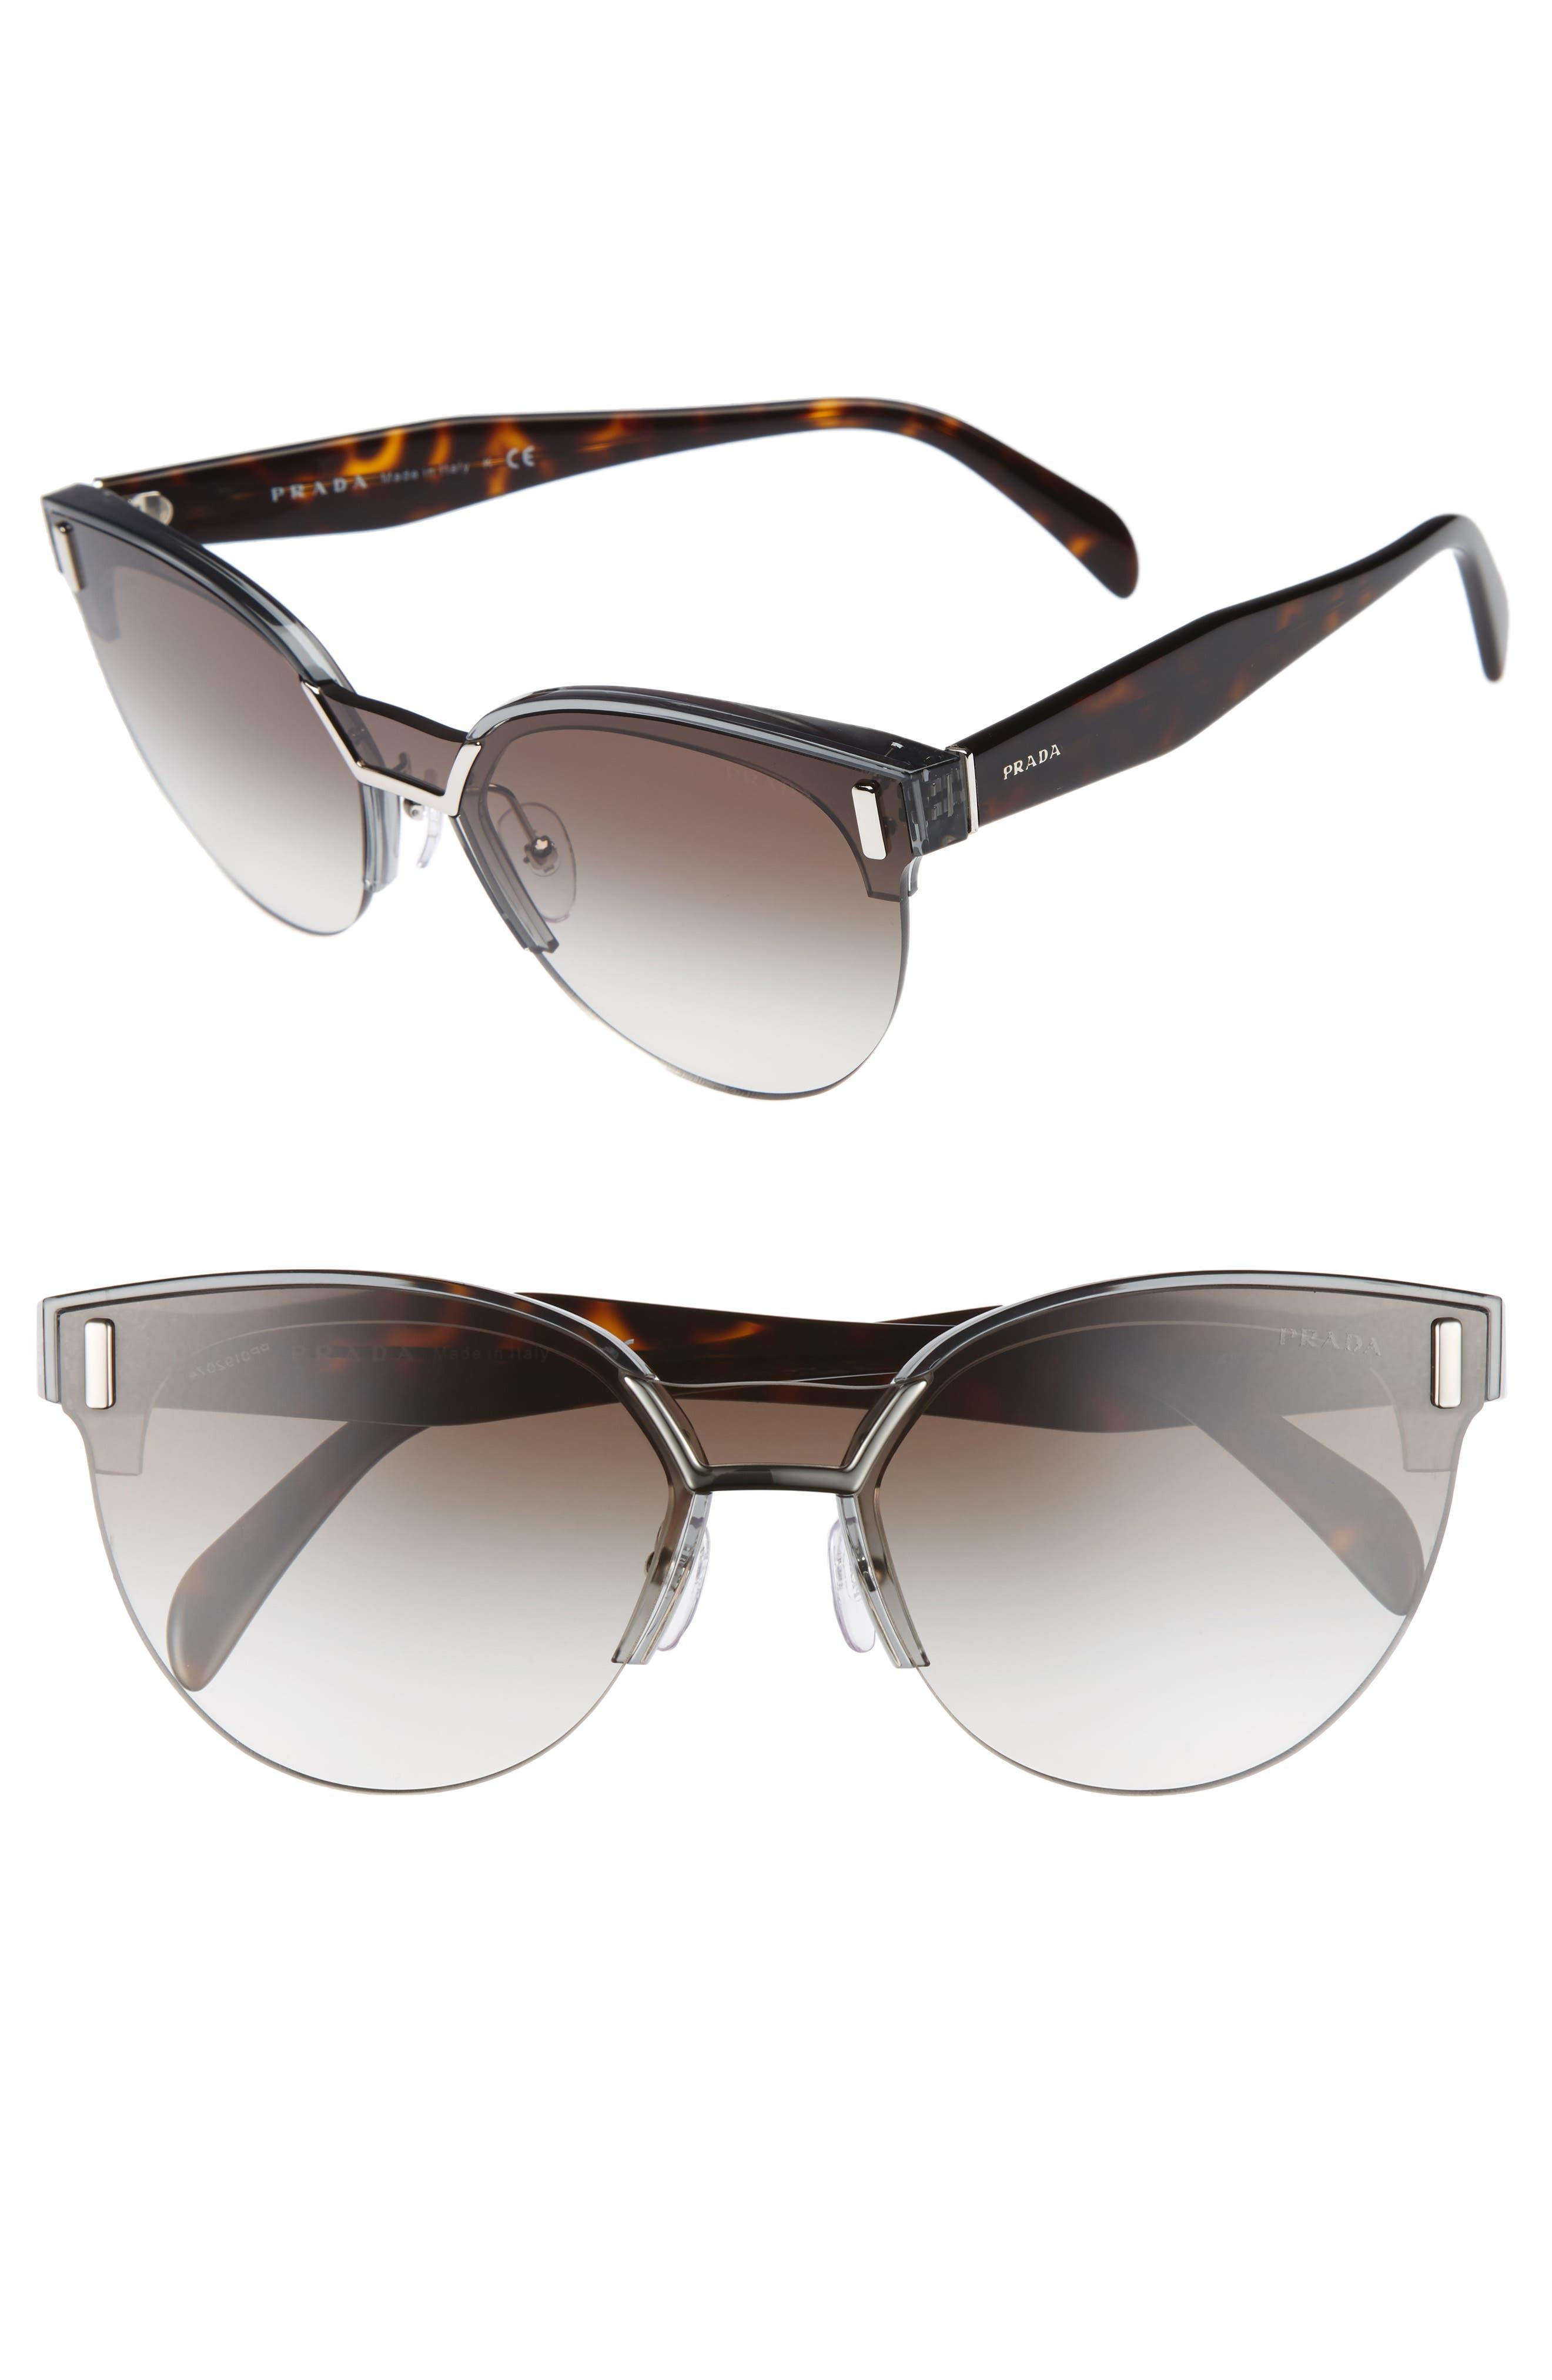 50mm Semi Rimless Gradient Sunglasses,                             Main thumbnail 1, color,                             025